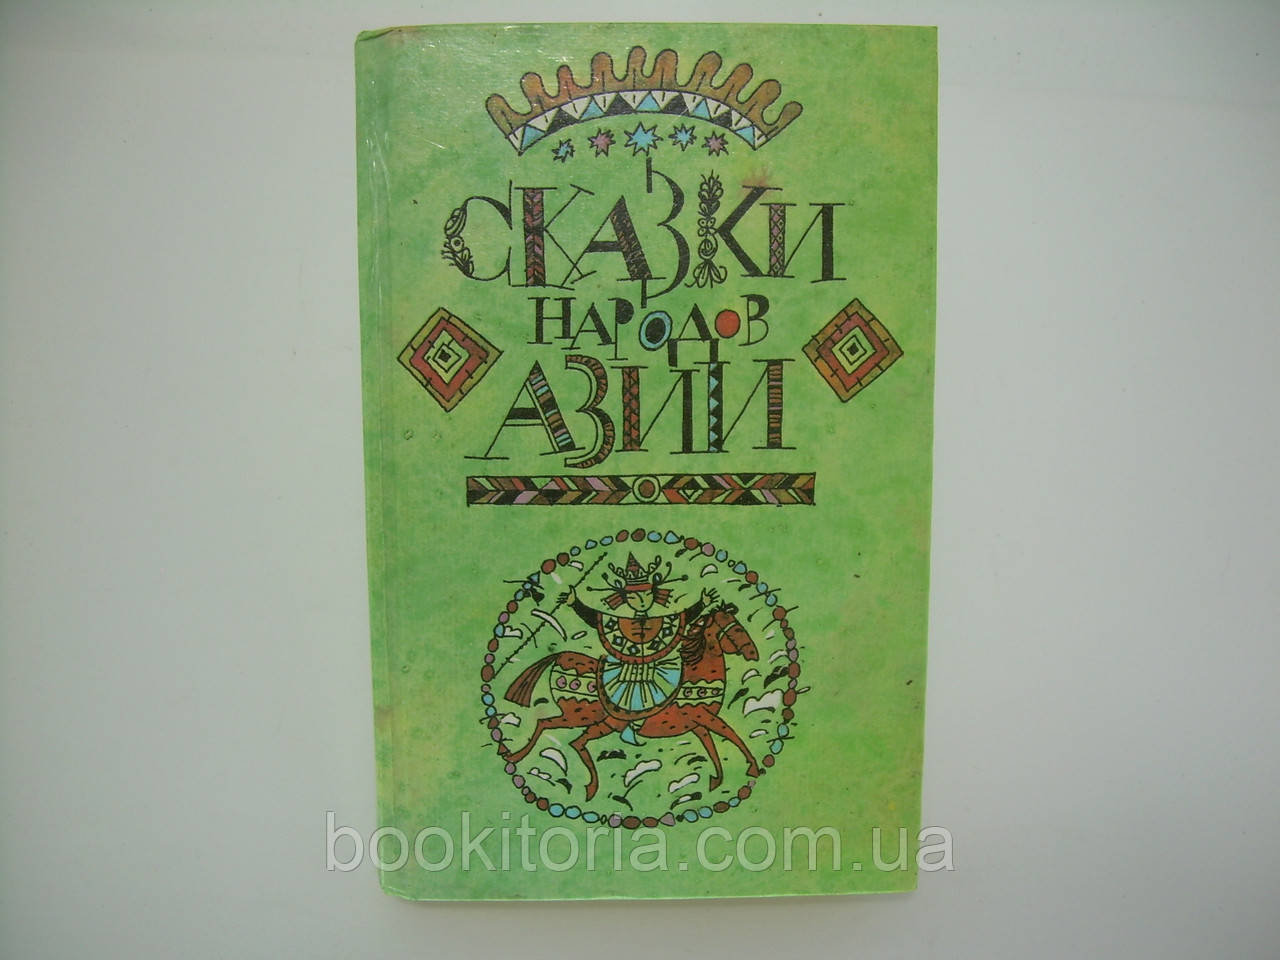 Сказки народов Азии (б/у).